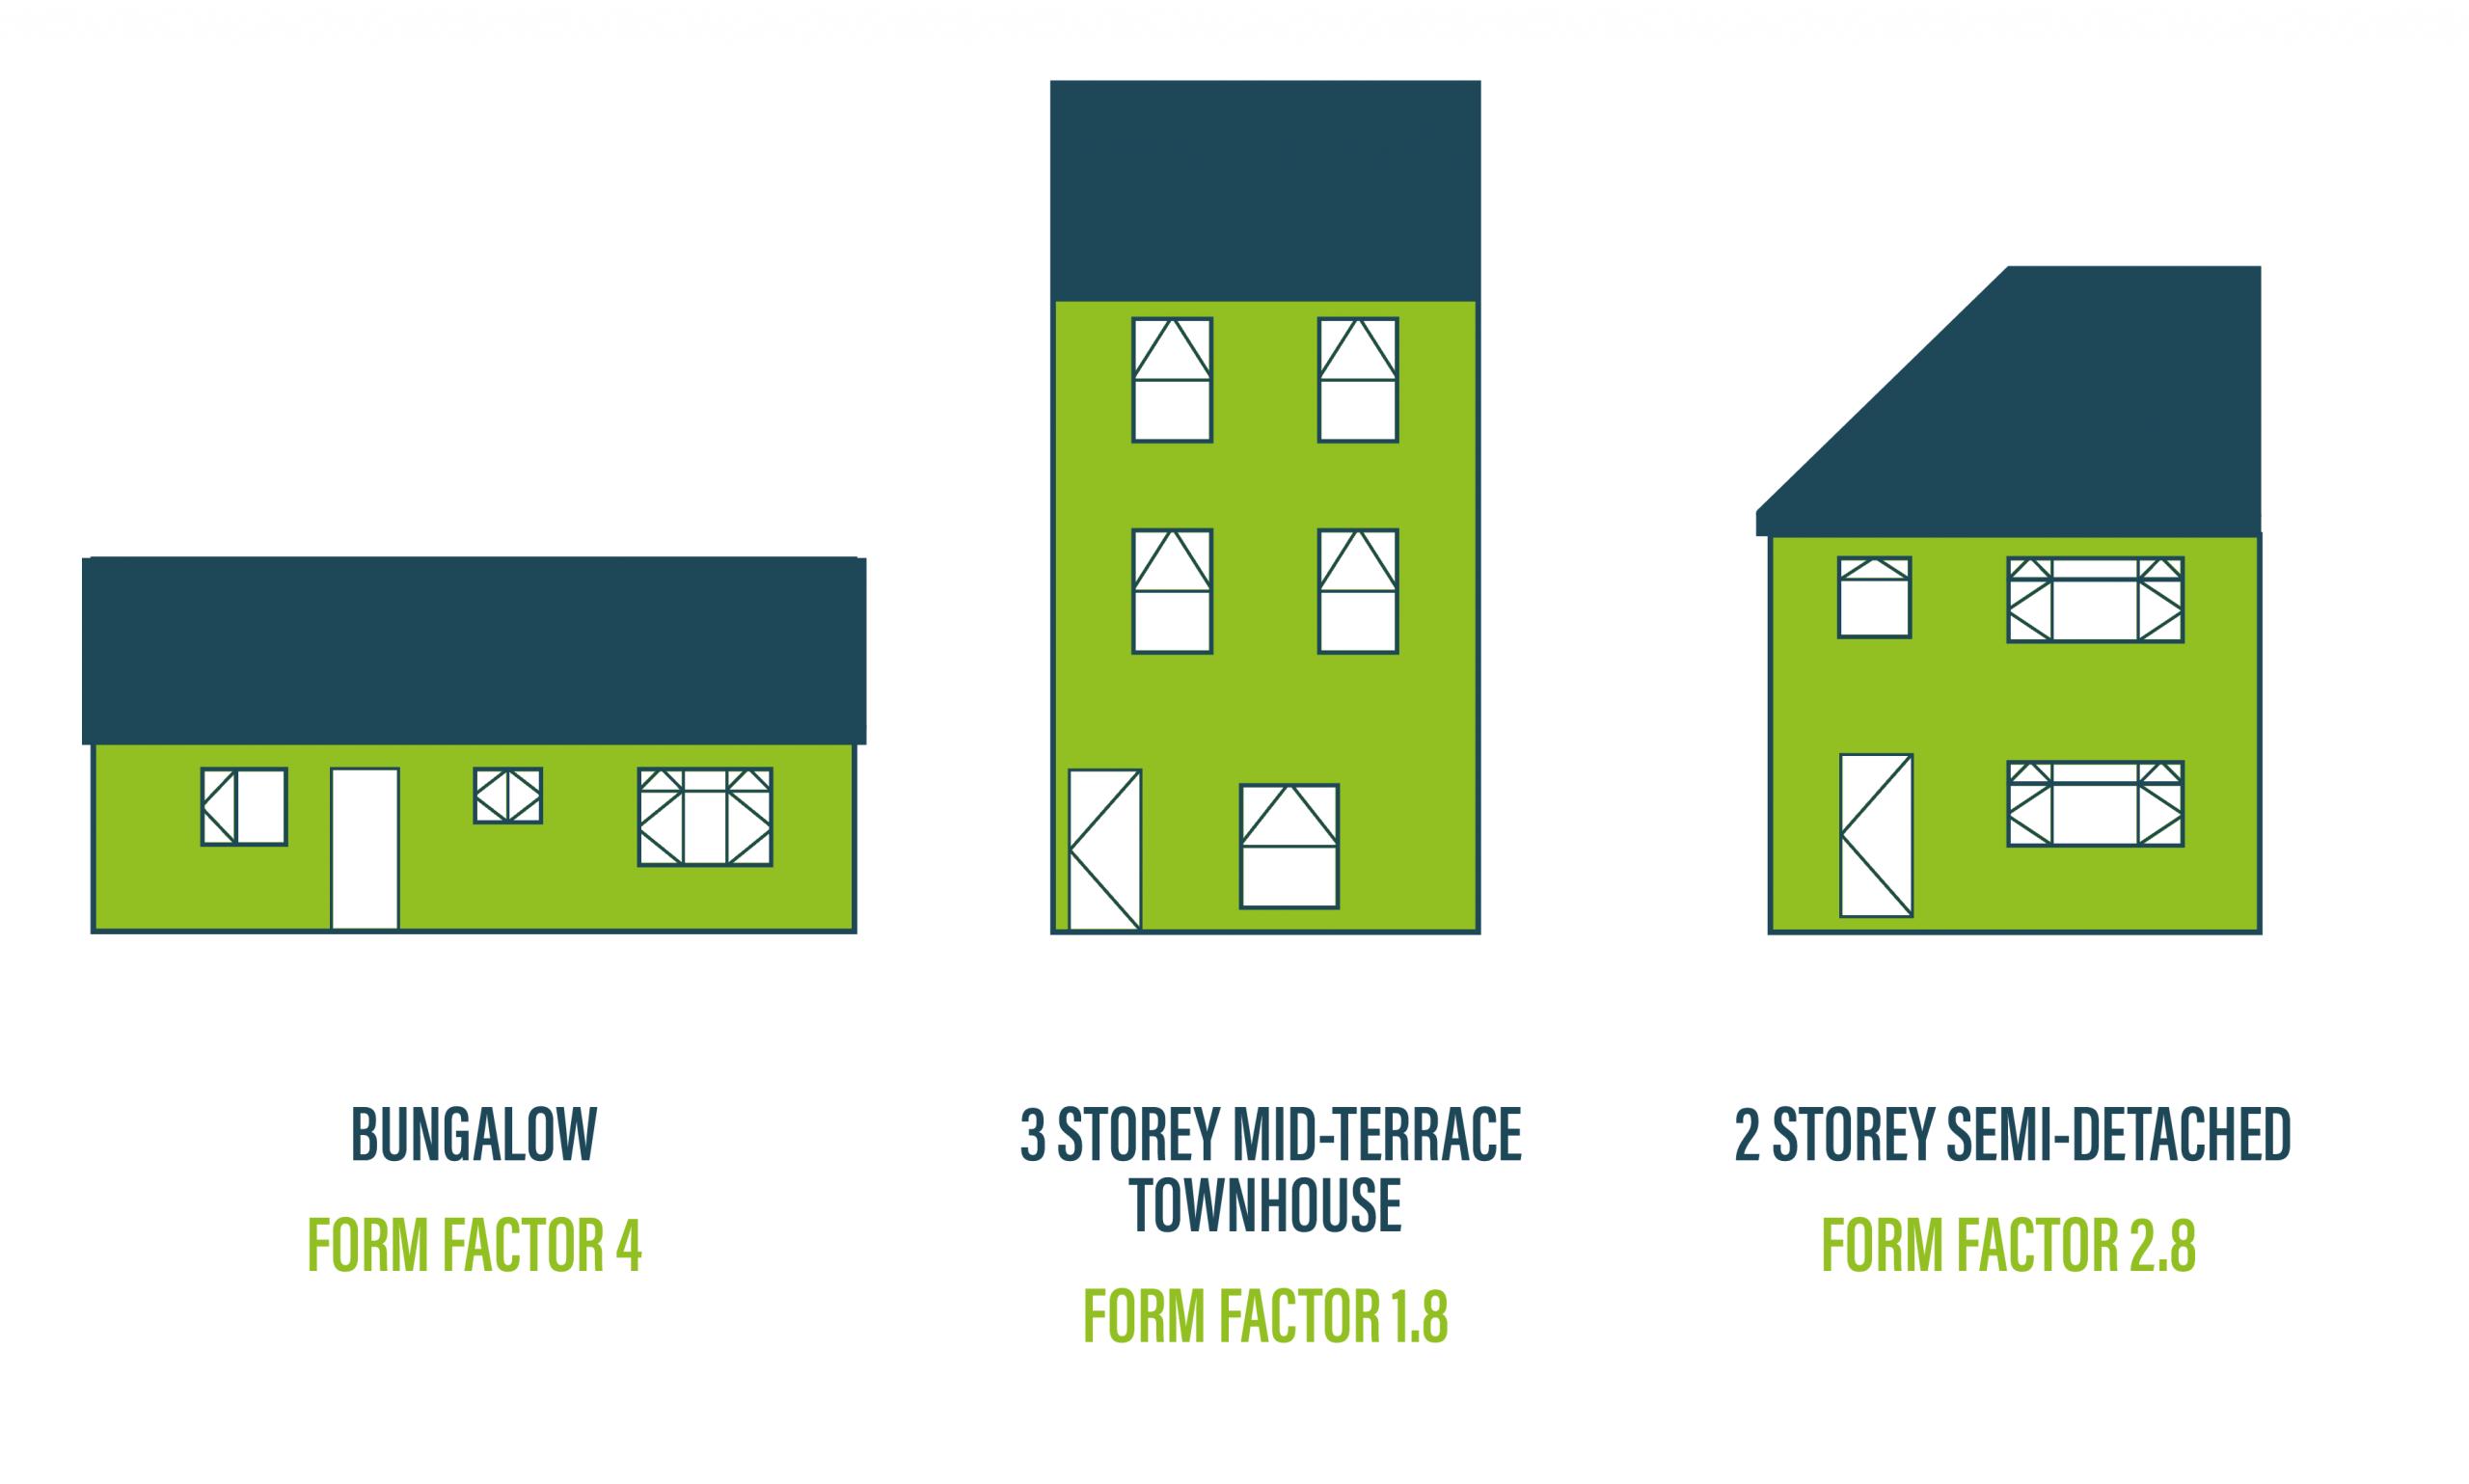 Building Form Factor